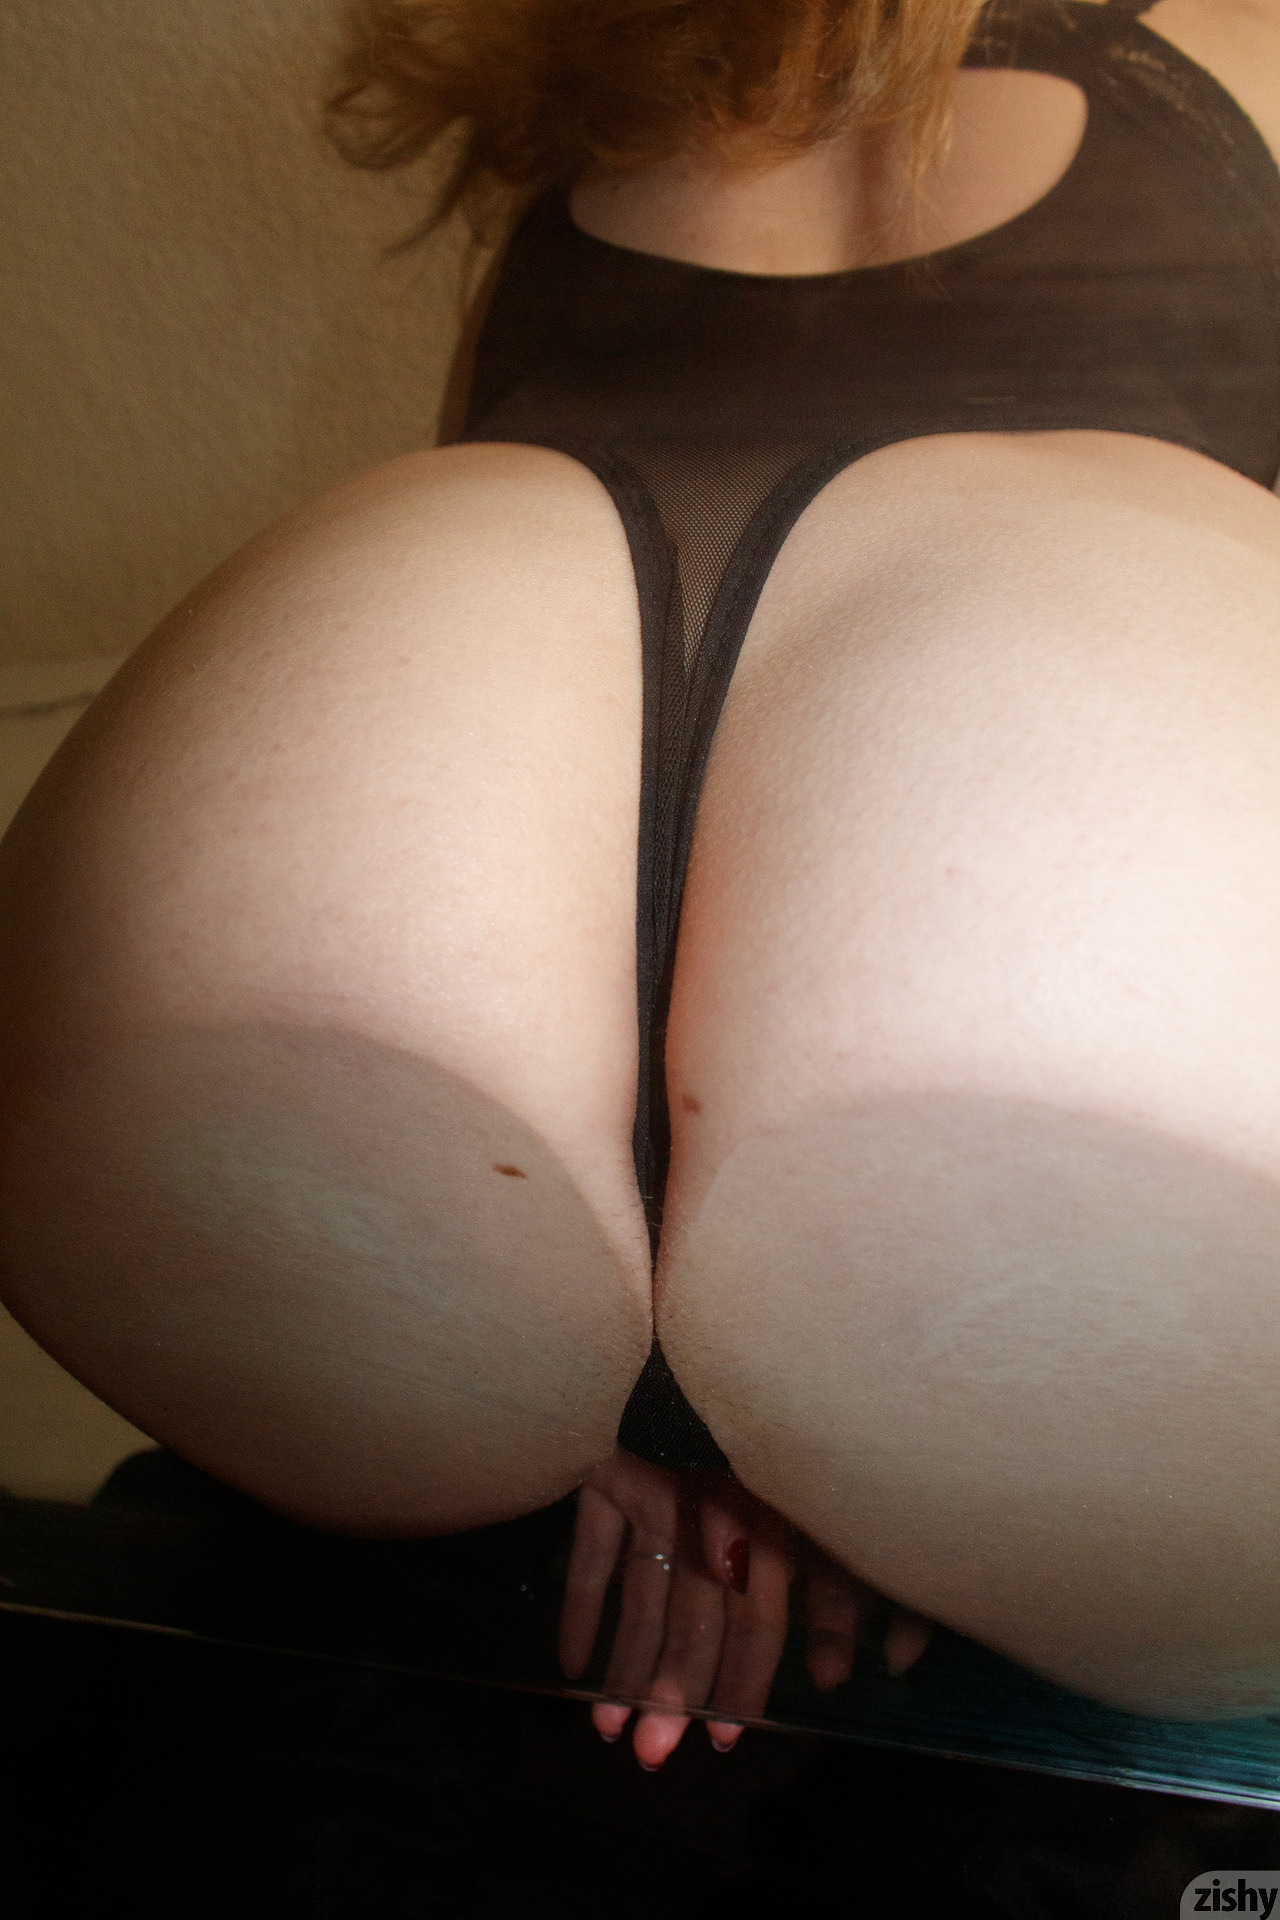 Giana Van Patten Black Coke Mirror Zishy (35)